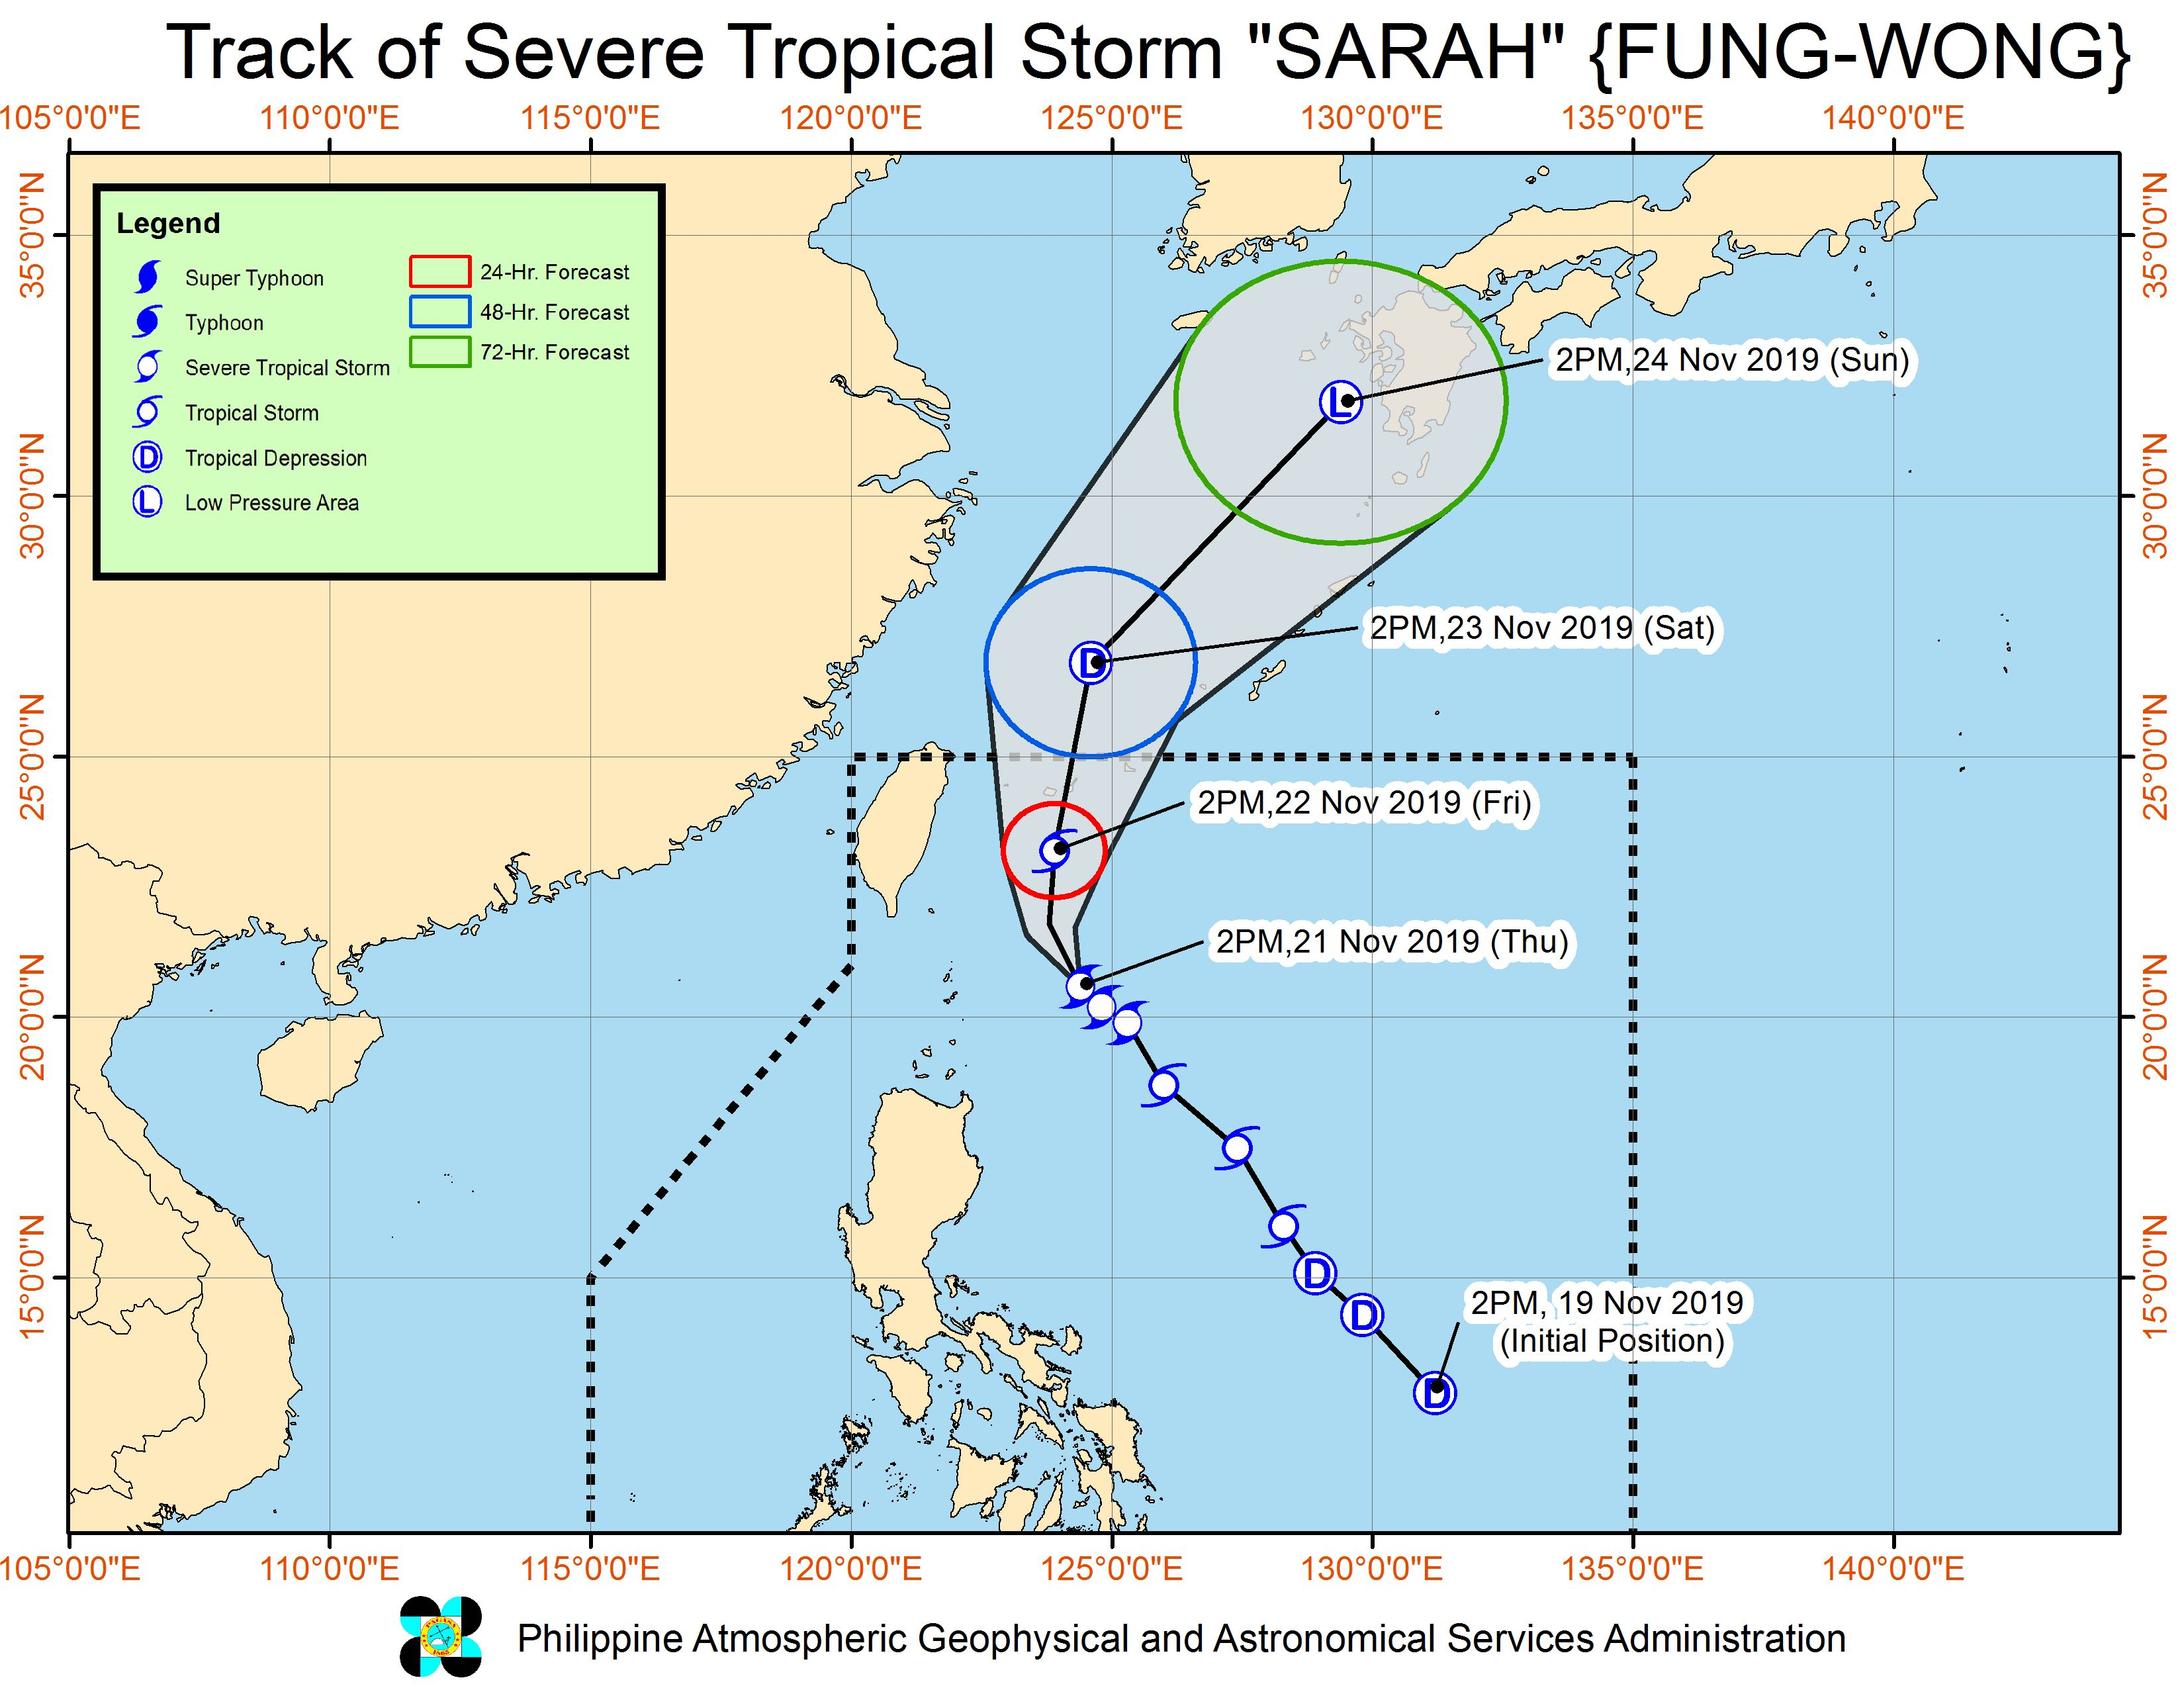 Forecast track of Severe Tropical Storm Sarah (Fung-wong) as of November 21, 2019, 5 pm. Image from PAGASA